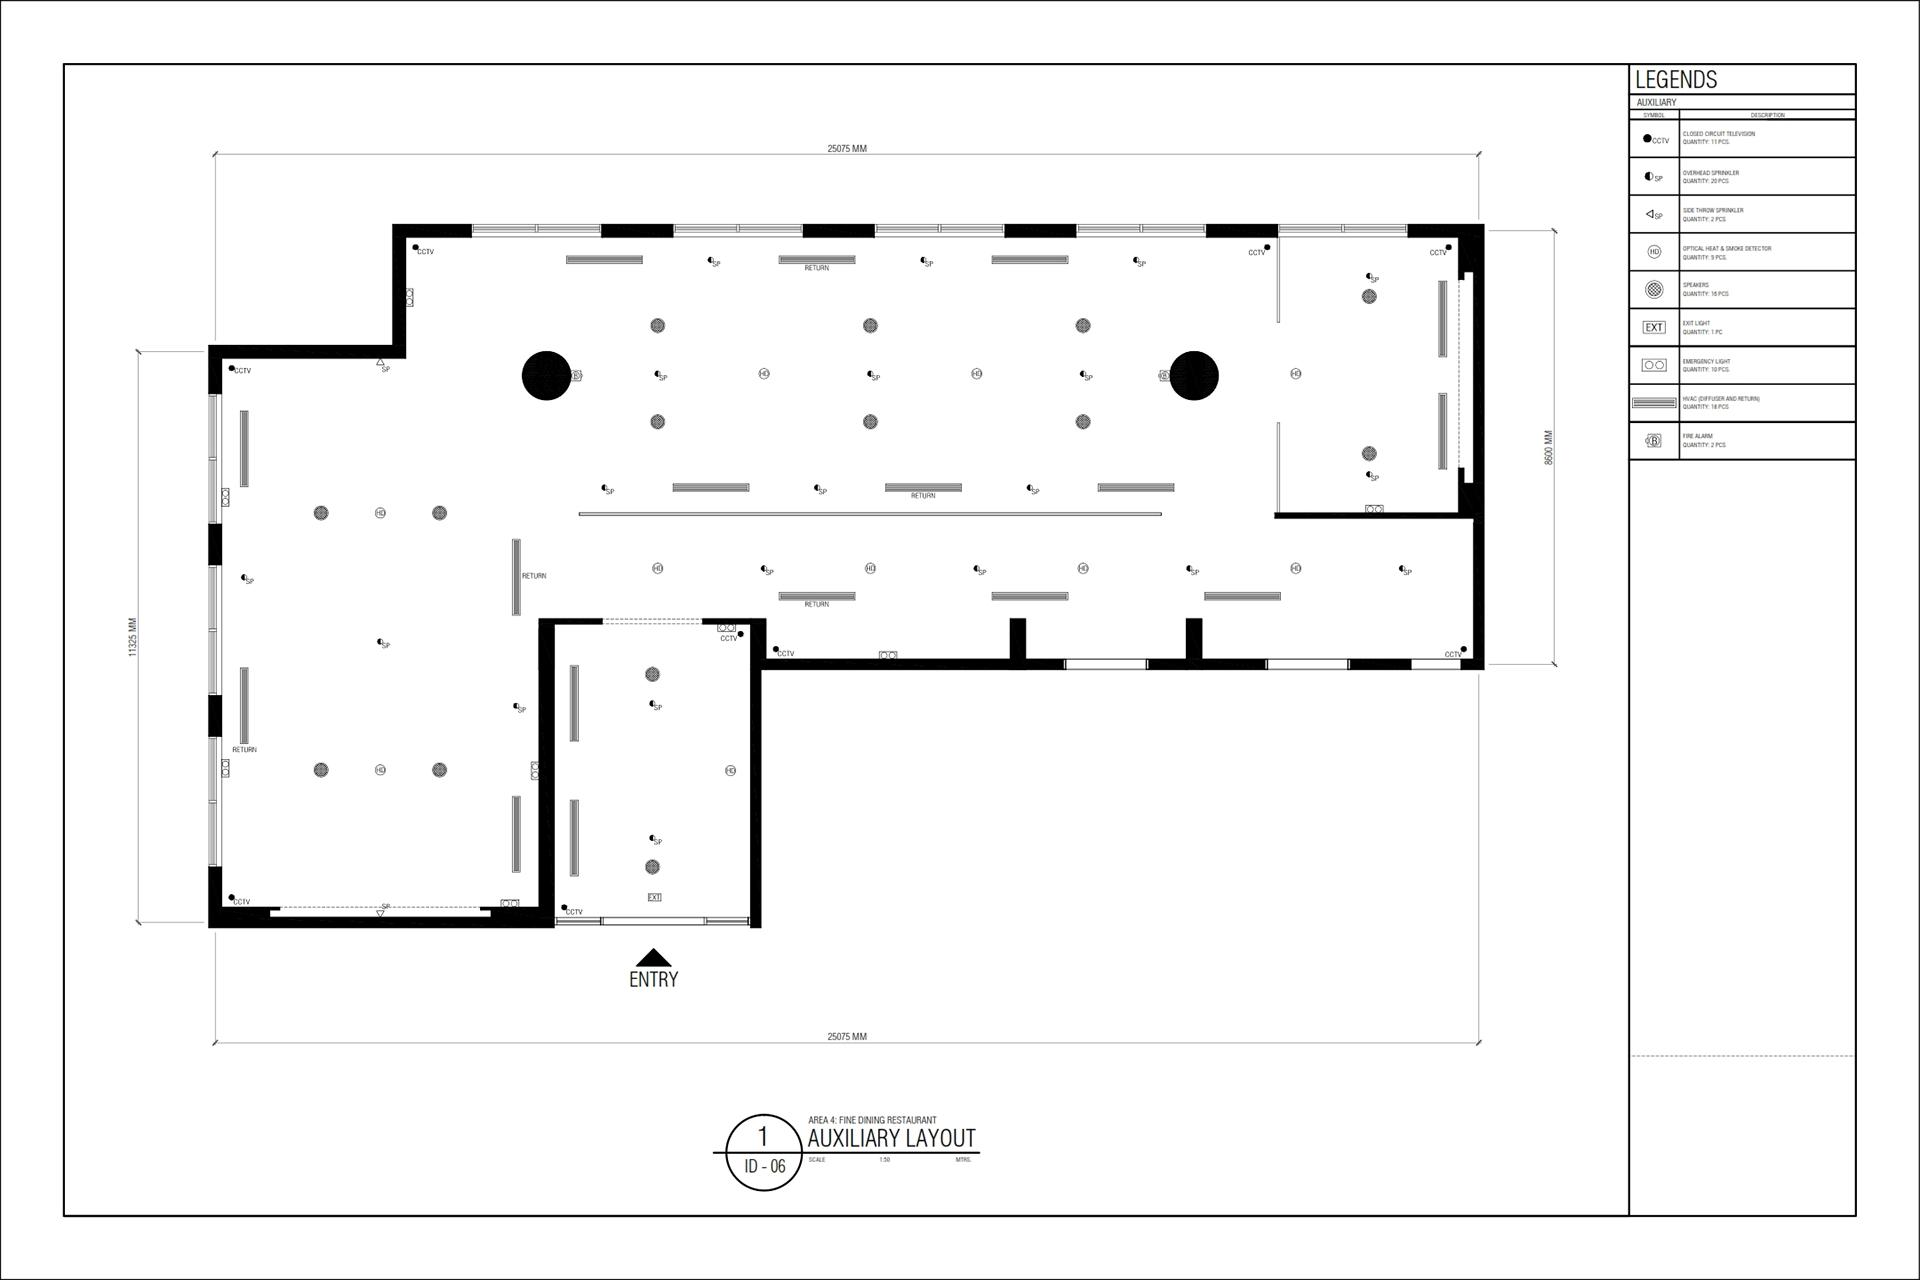 Area 4 Fine Dining Restaurant Design Concept Sumptuous On Behance